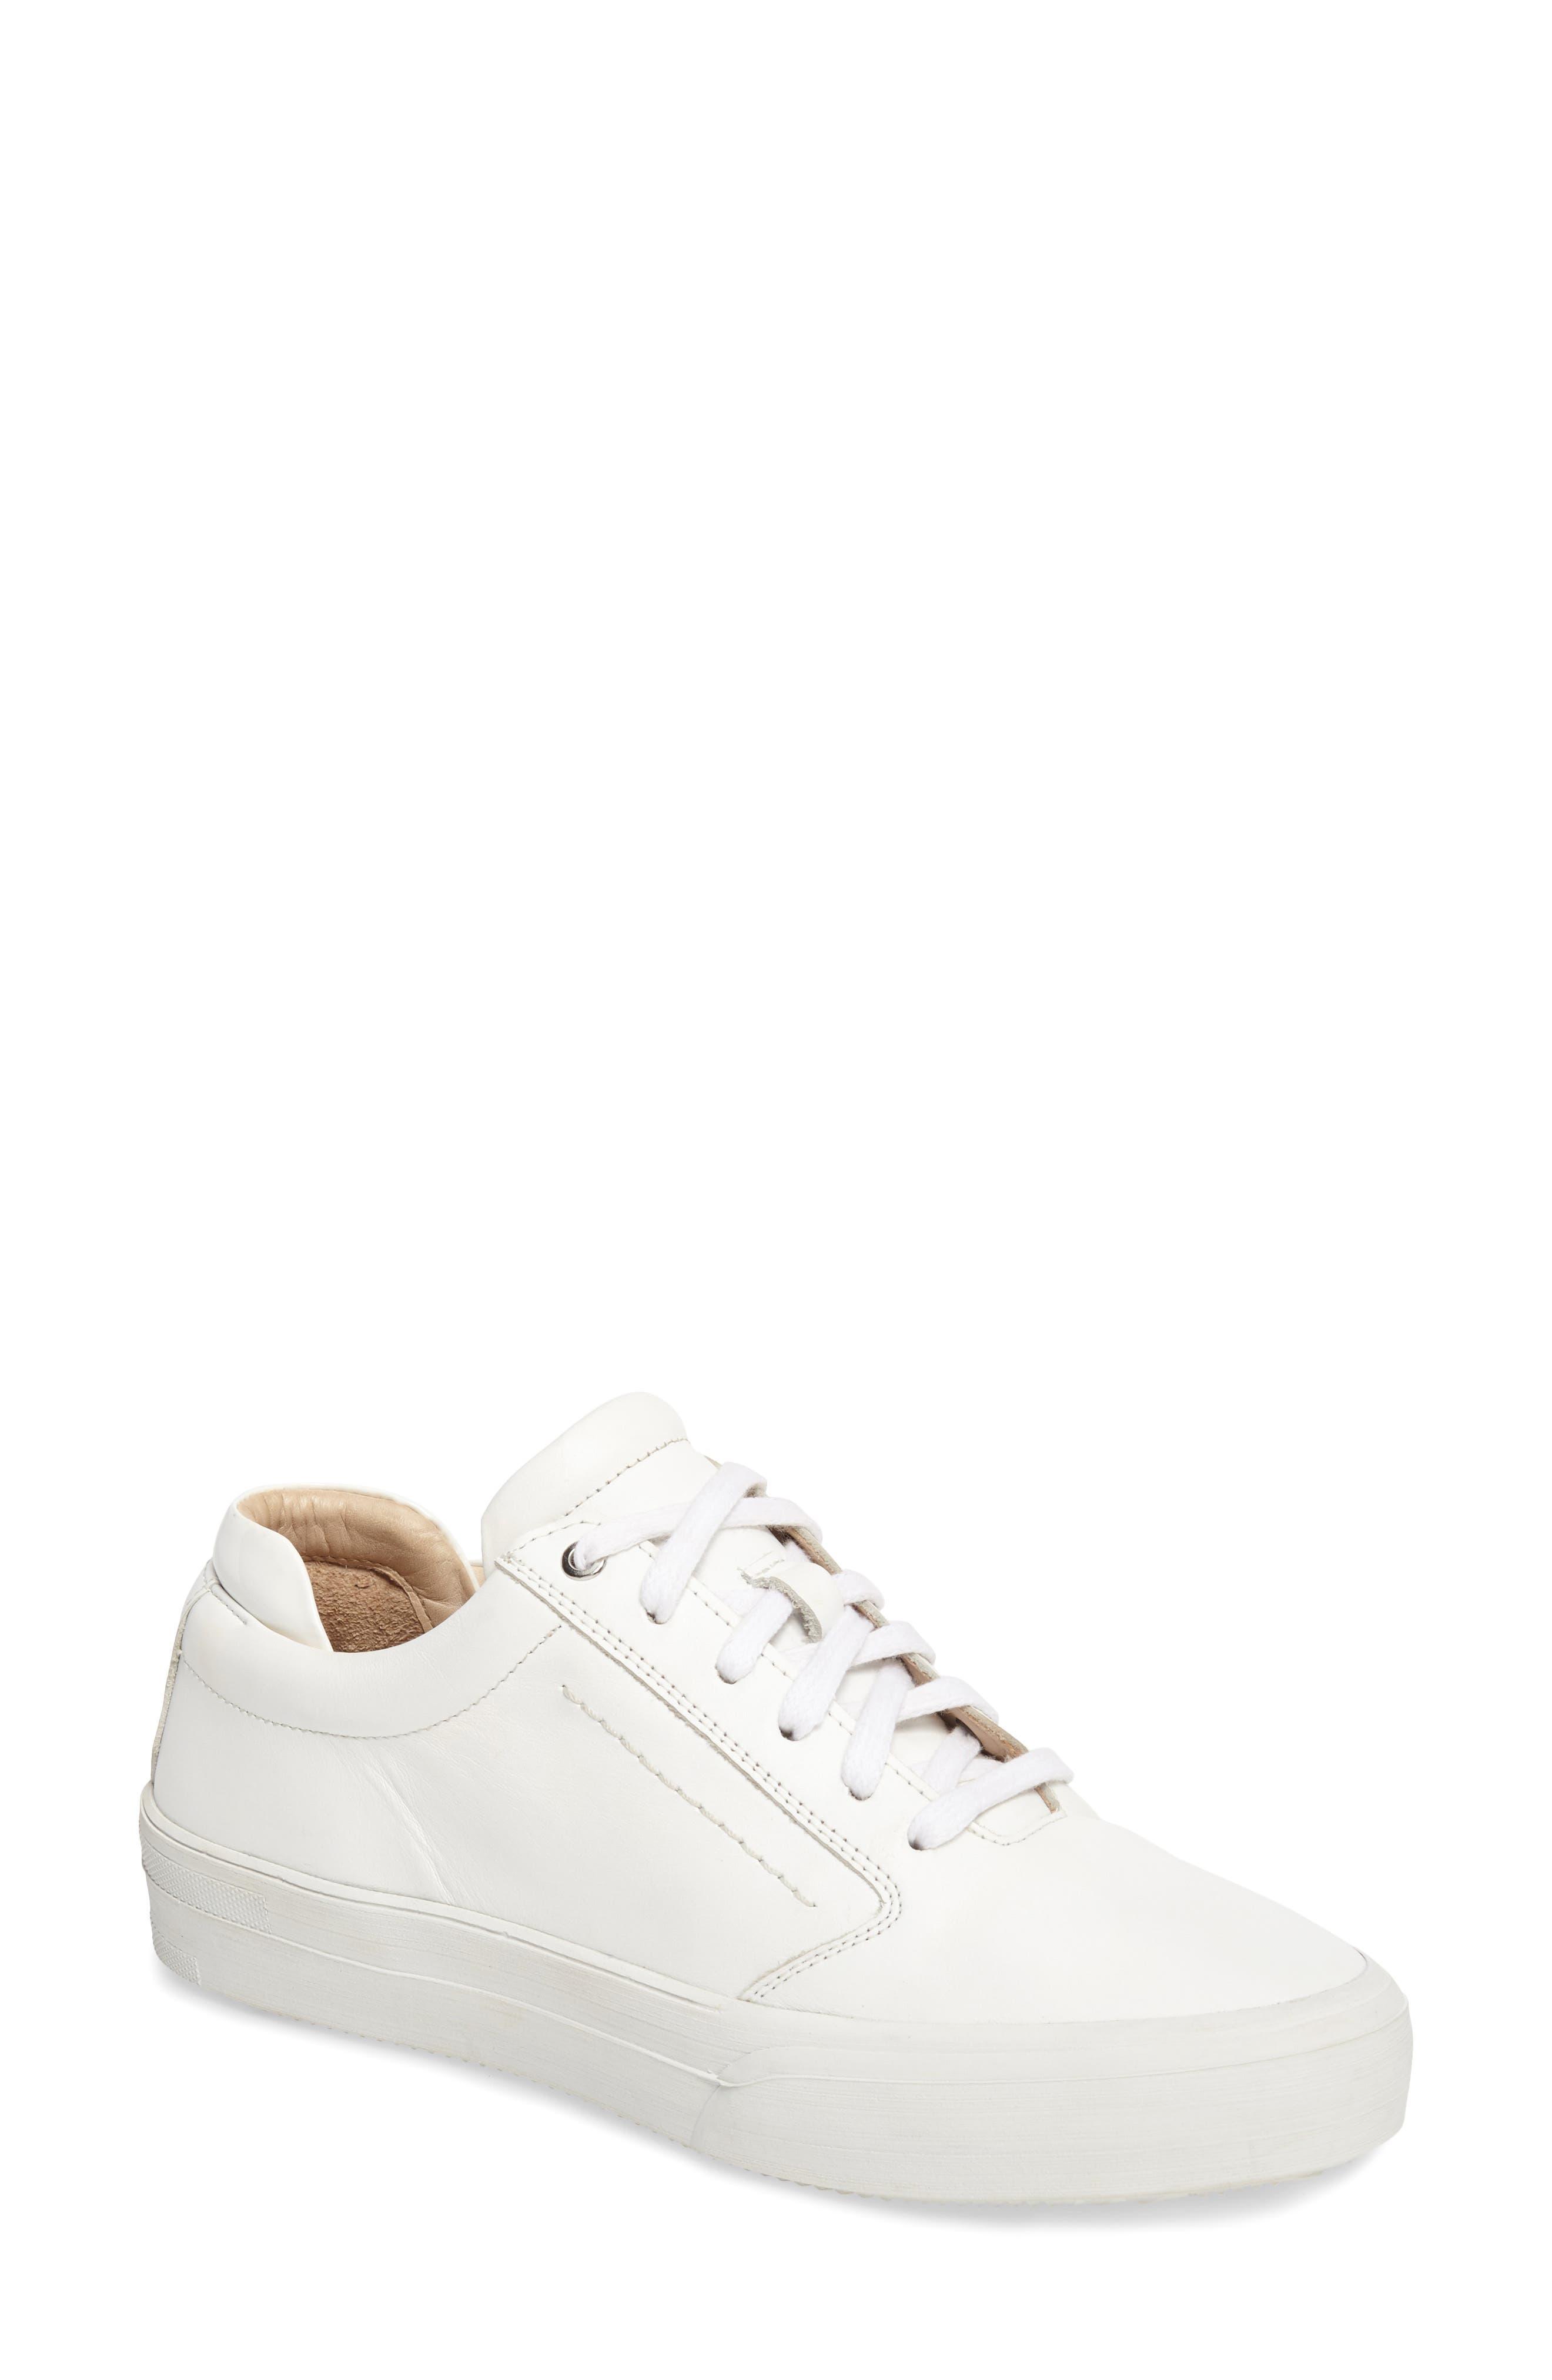 Lalibela Sneaker,                         Main,                         color, White/Patent White